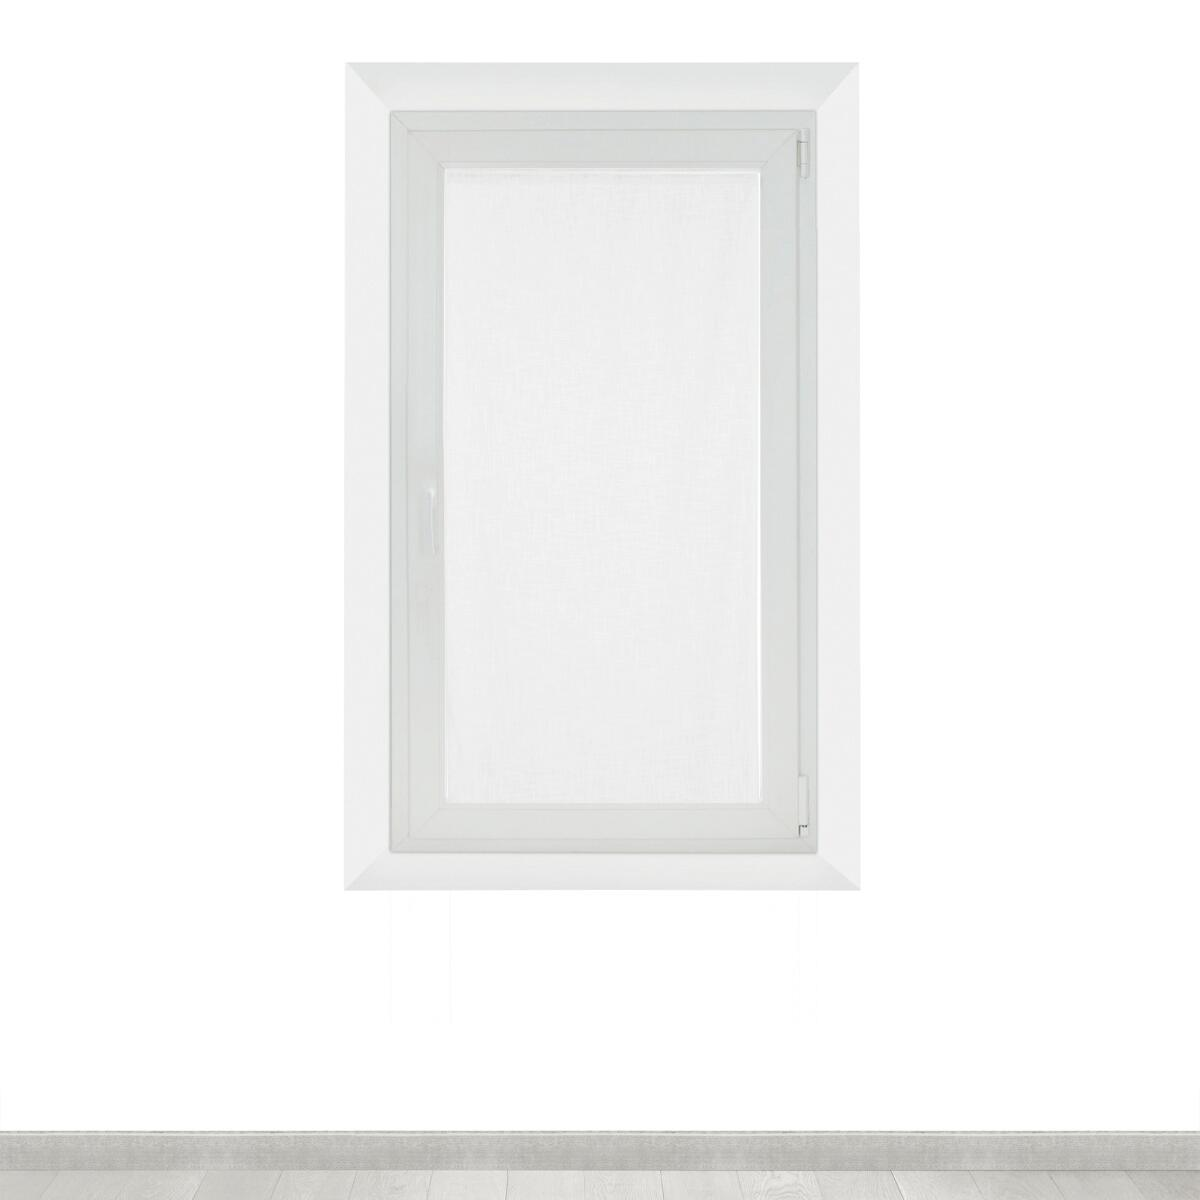 Tendina vetro Infini bianco tunnel 60 x 120 cm - 2